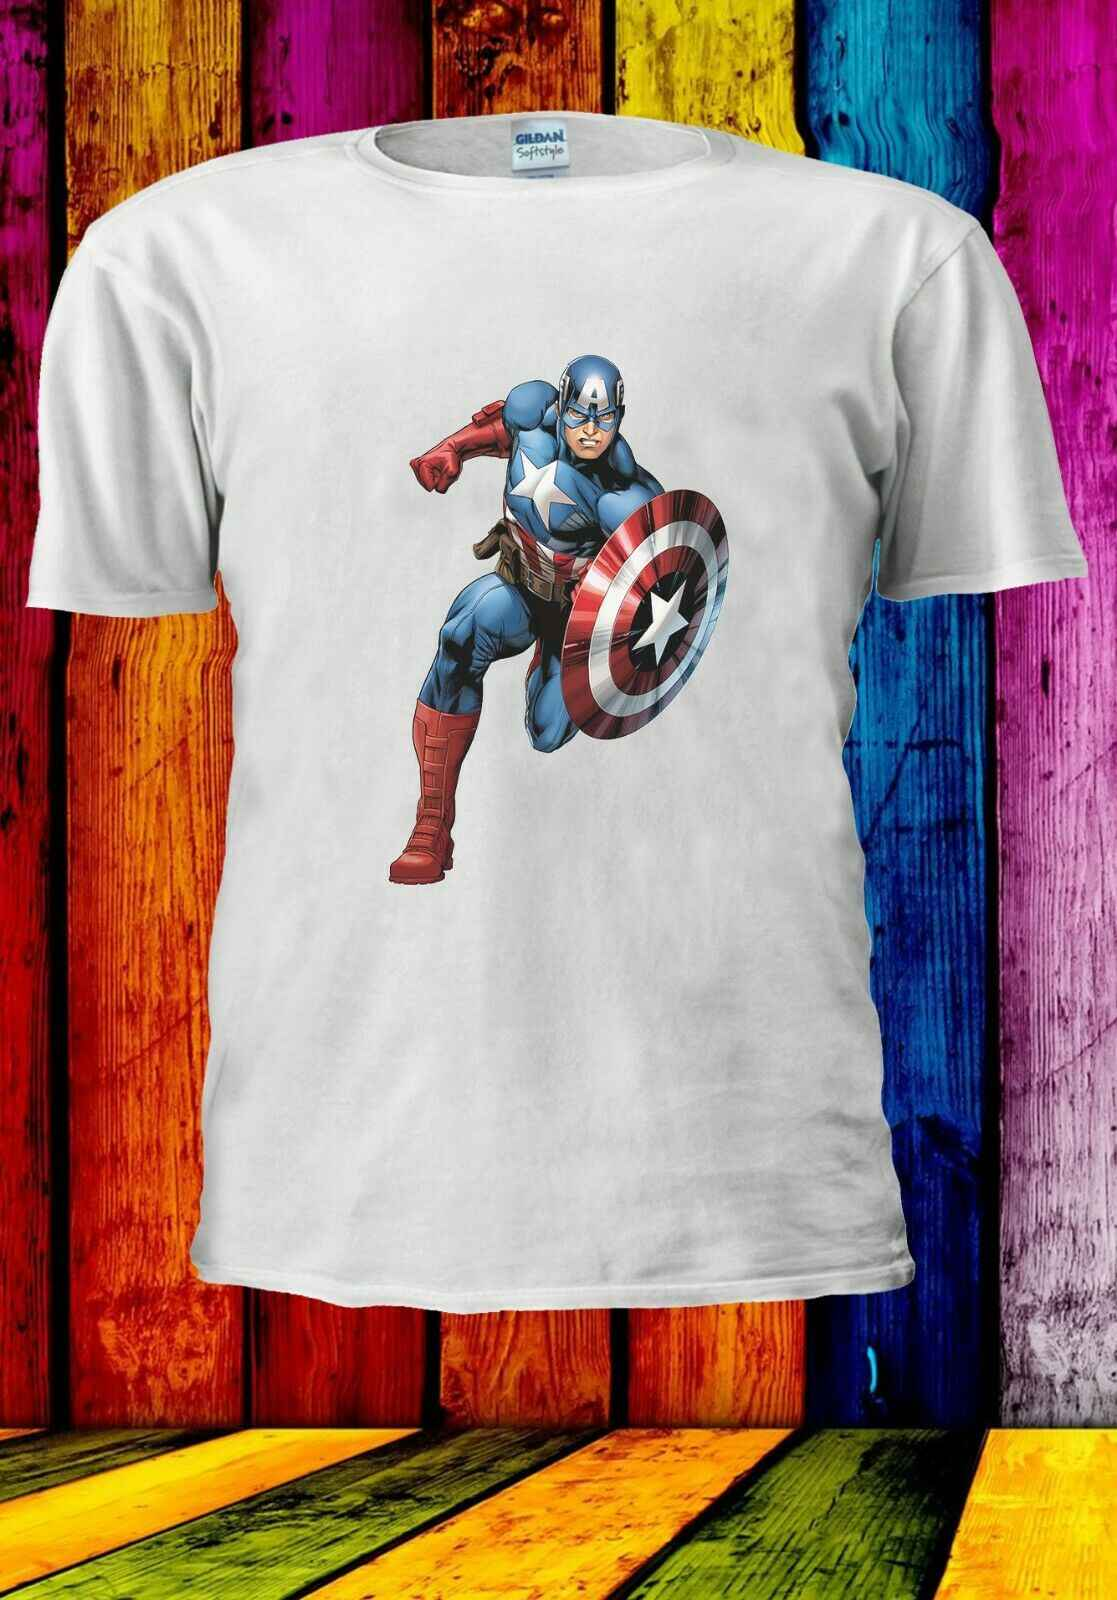 Kapitan ameryka Superhero Avengers Steve Rogers mężczyźni kobiety Unisex T-shirt 2863